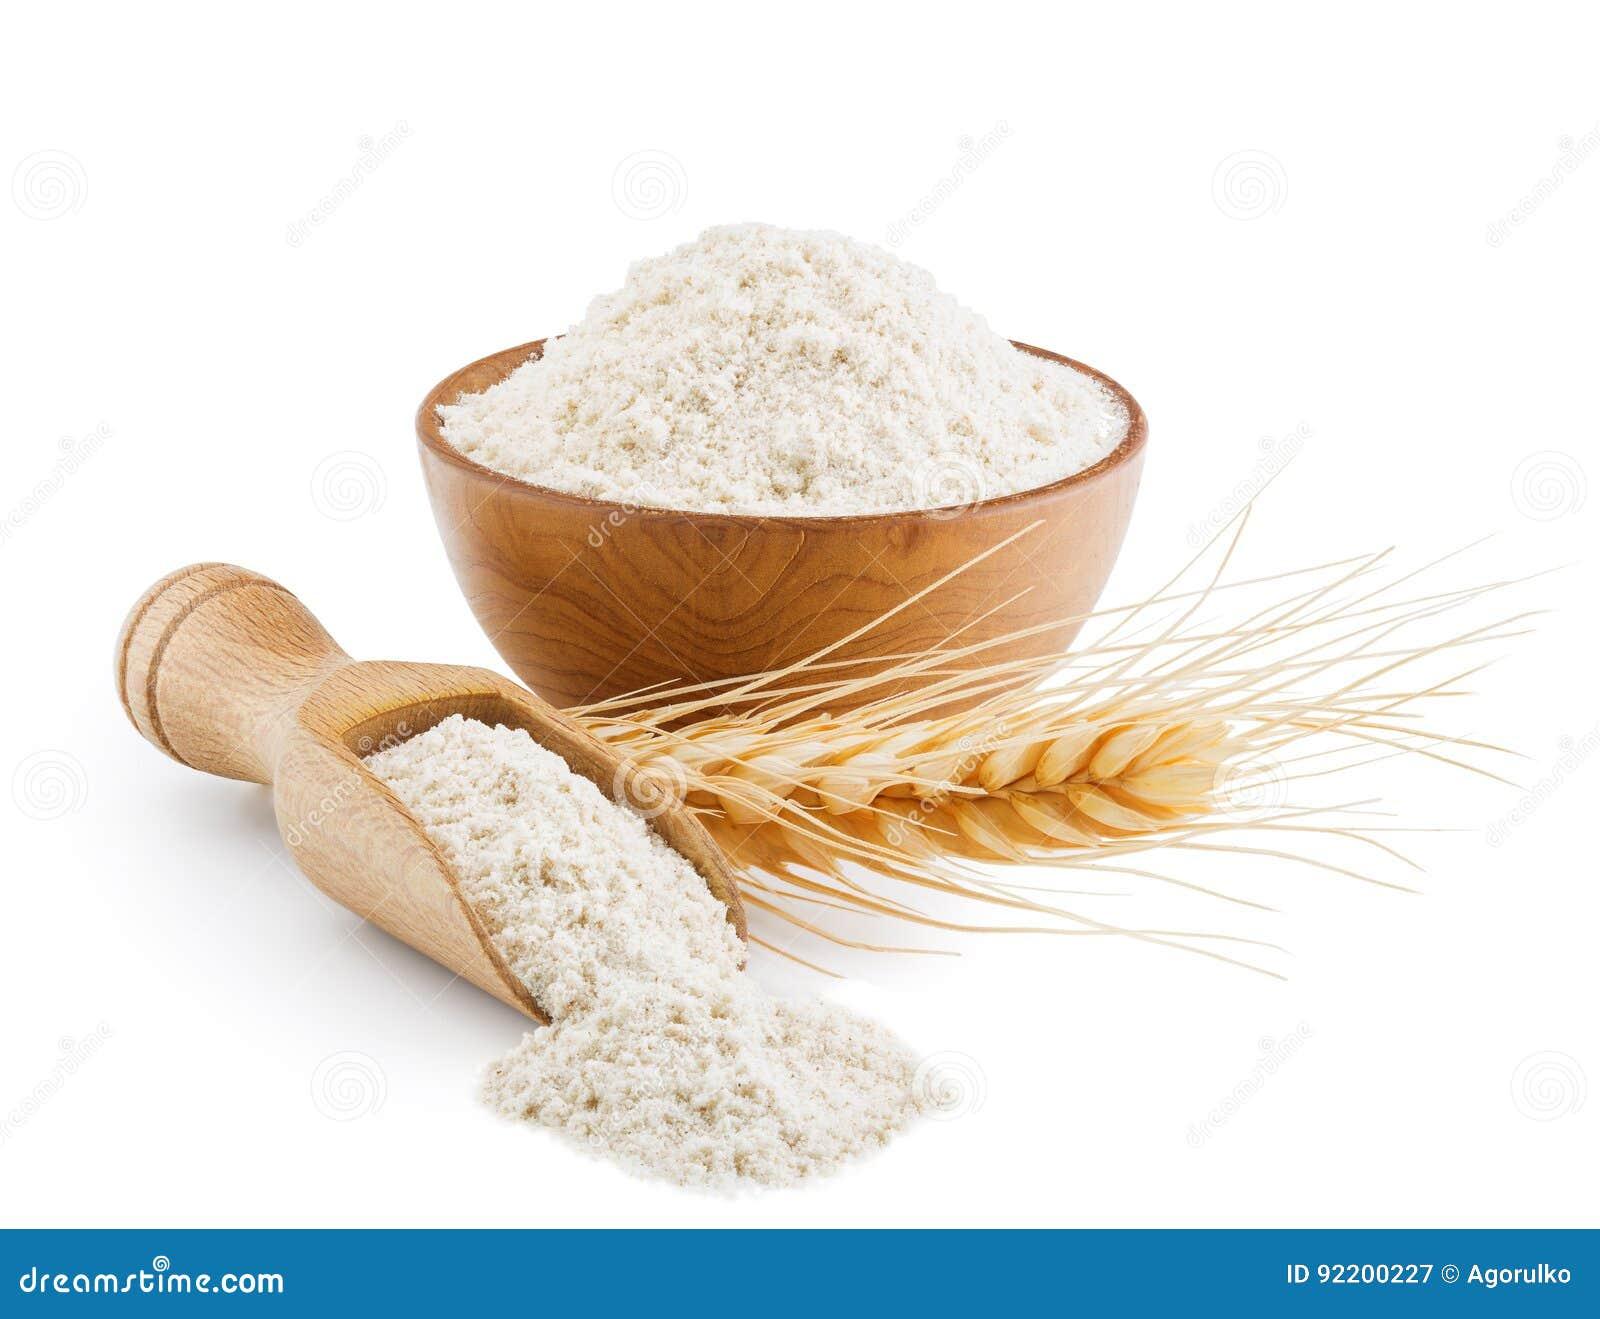 Helt kornvetemjöl som isoleras på vit